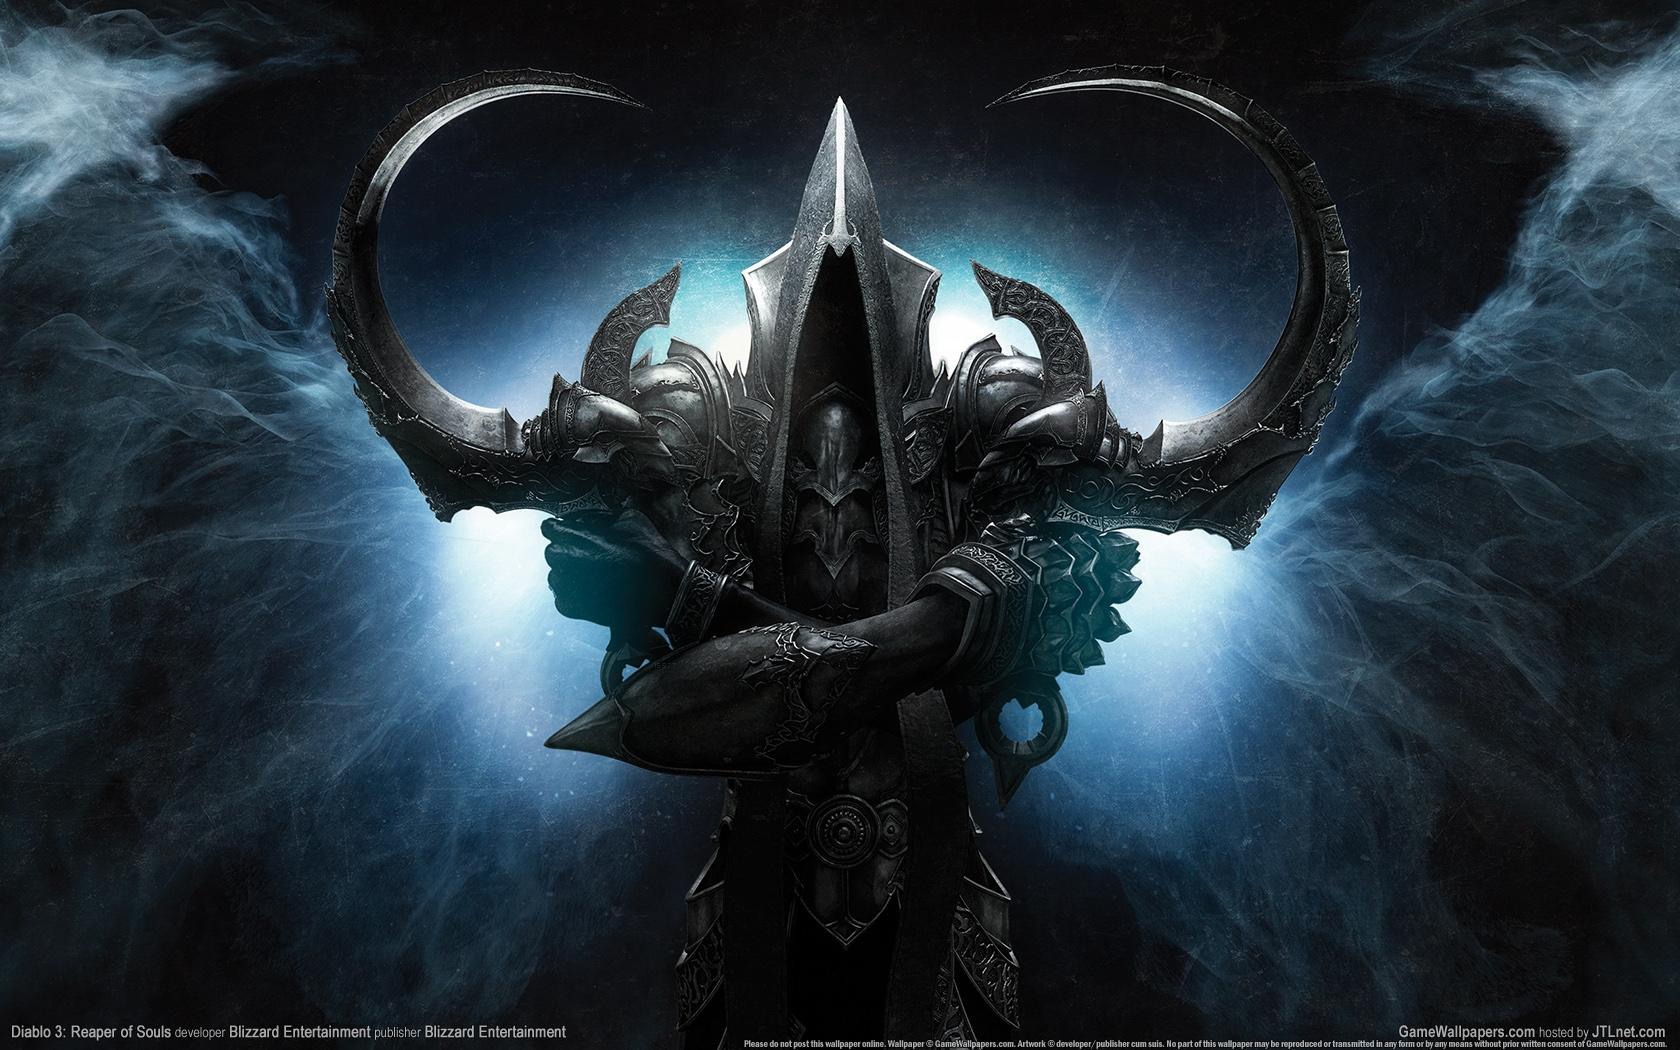 Mw3 3d Wallpapers Diablo Reaper Of Souls Wallpaper 1680x1050 67415